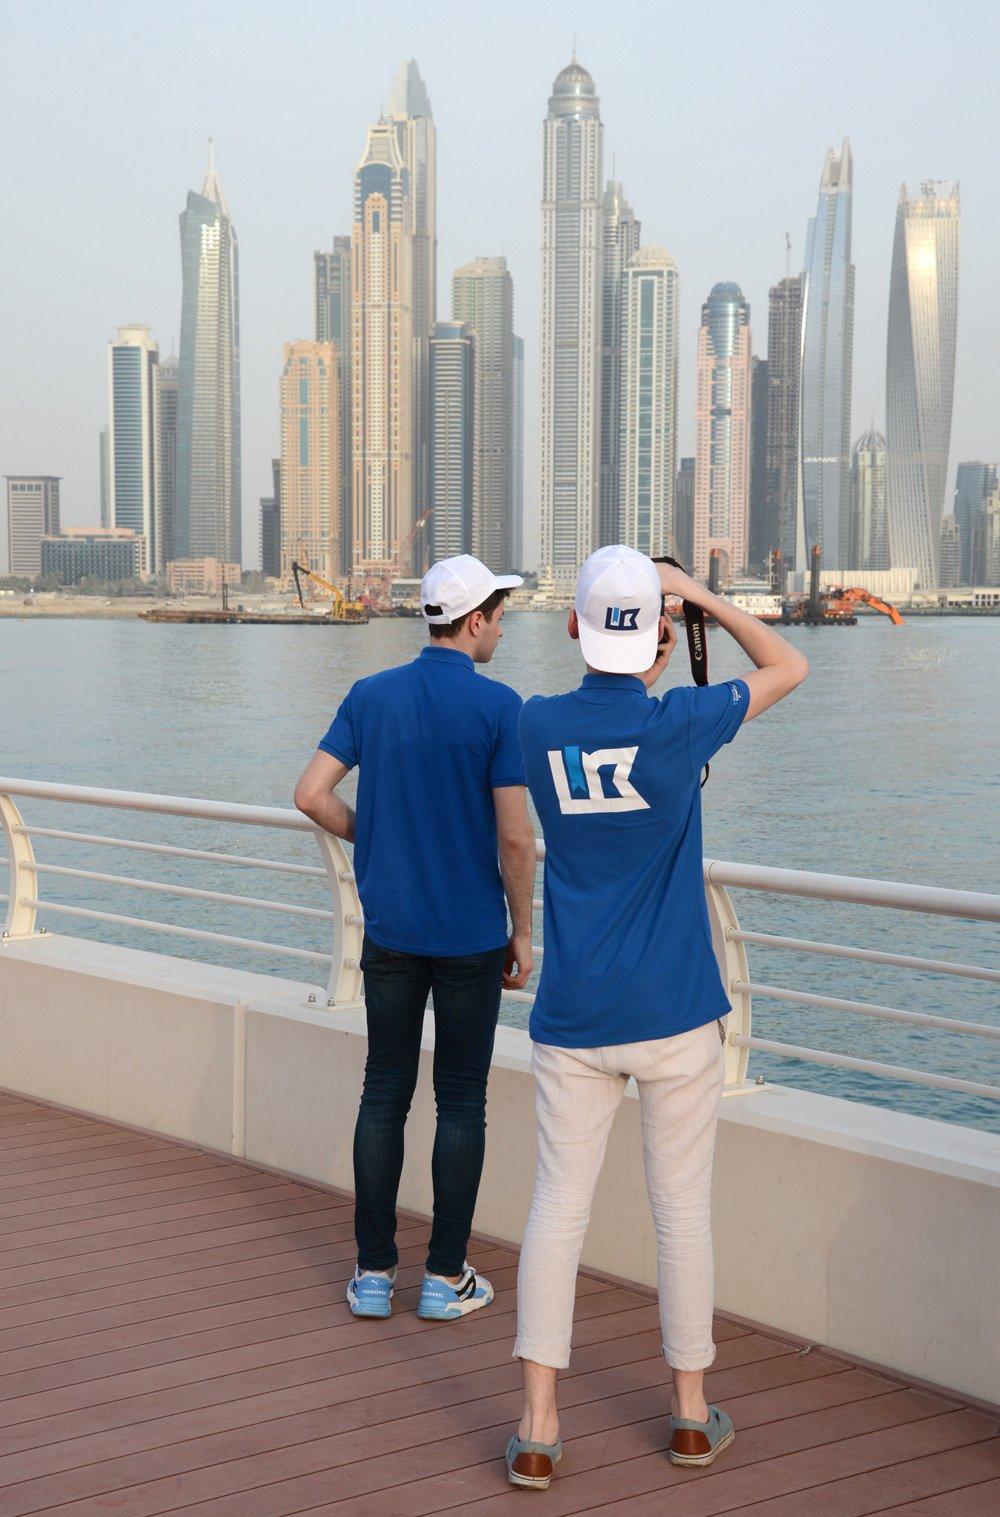 Борис Колесников показал студентам-архитекторам из Краматорска Дубай, фото-4